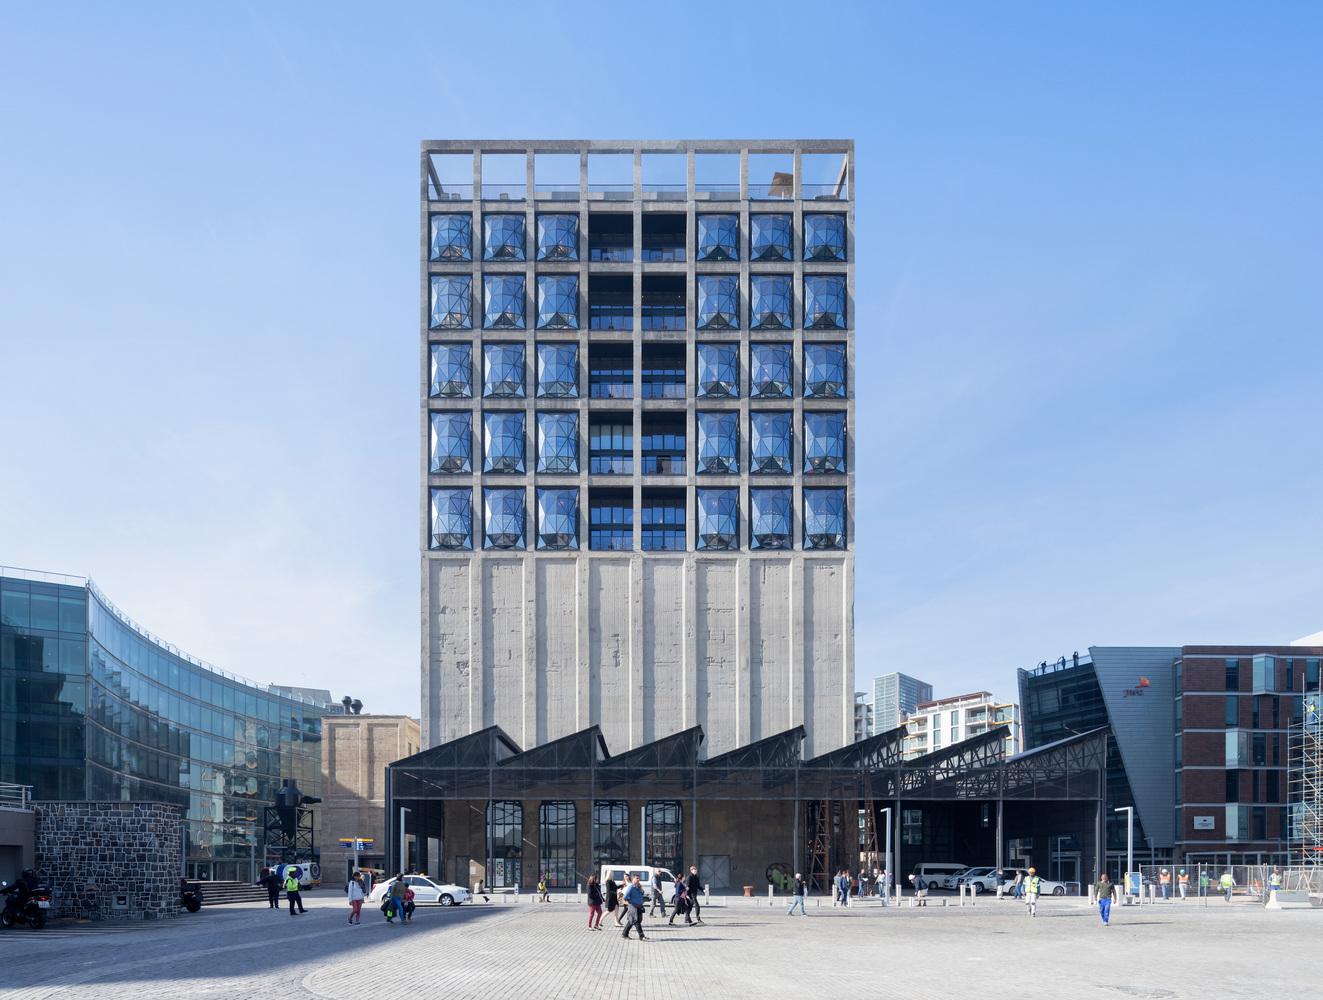 Kham phá kiến trúc nổi tiếng thế giới Zeitz MOCAA 2